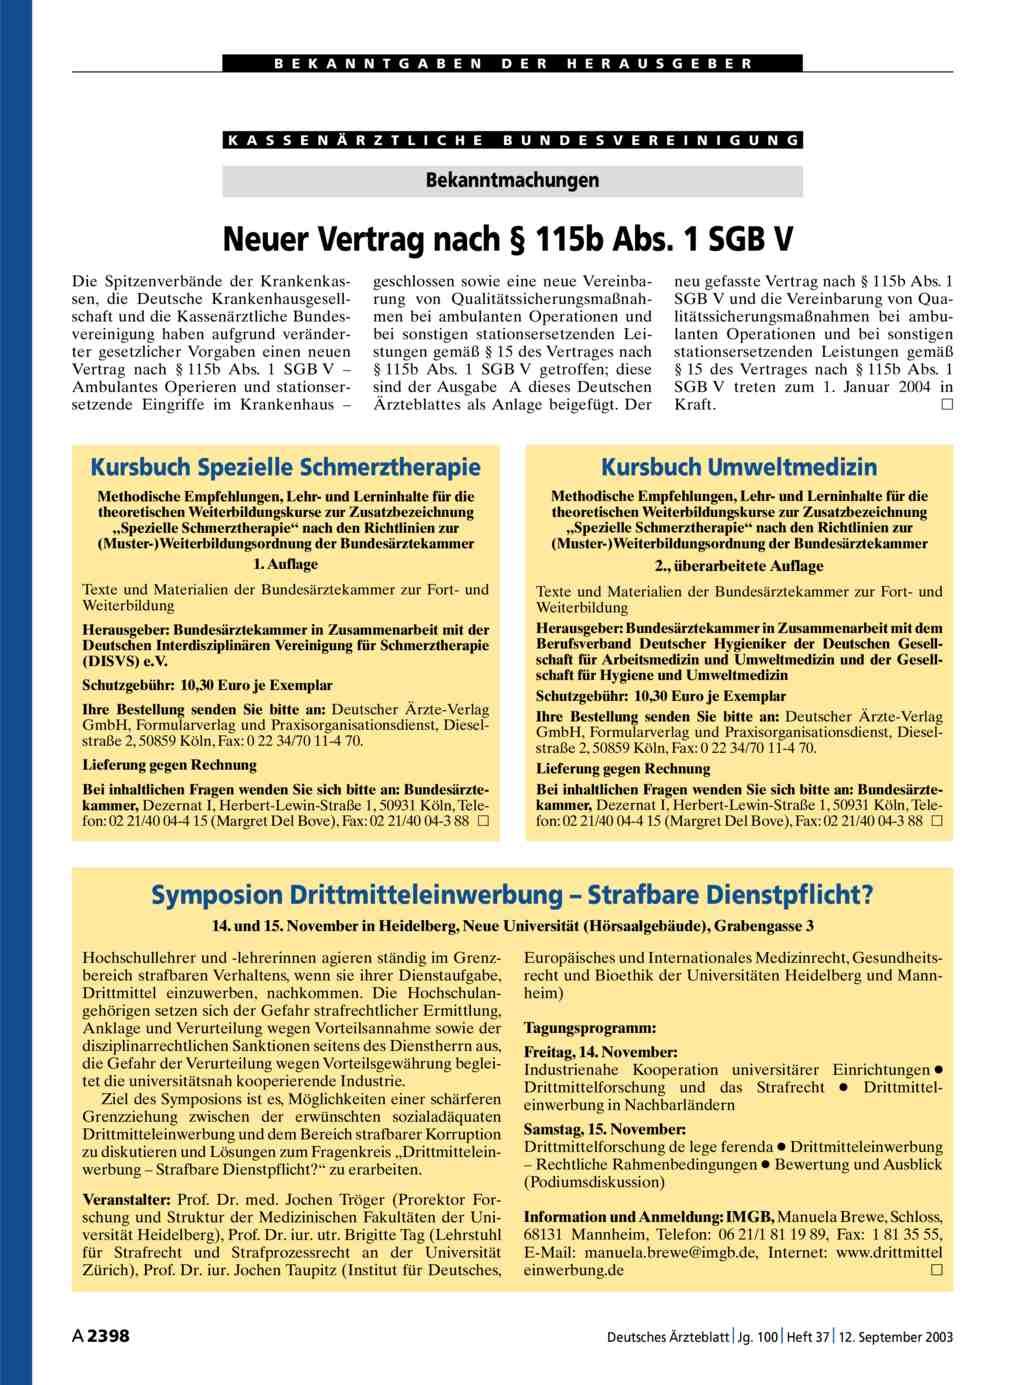 Neuer Vertrag Nach 115b Abs 1 Sgb V